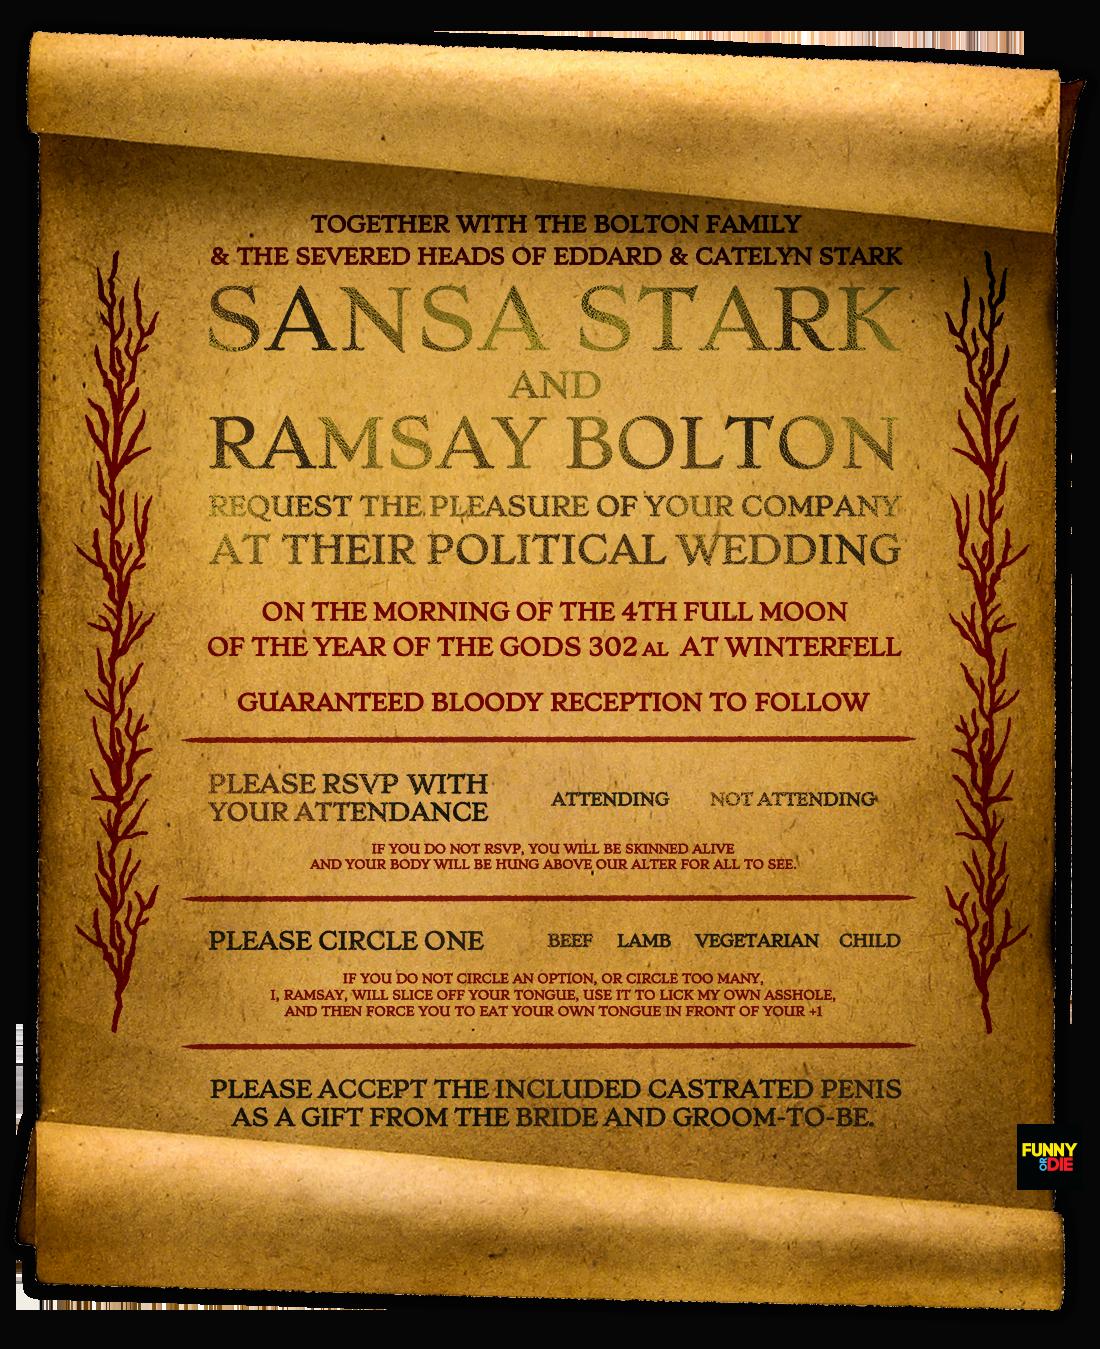 Zach Galifianakis Wedding Invitation Fresh Wedding Invitation for Sansa Stark and Ramsay Bolton